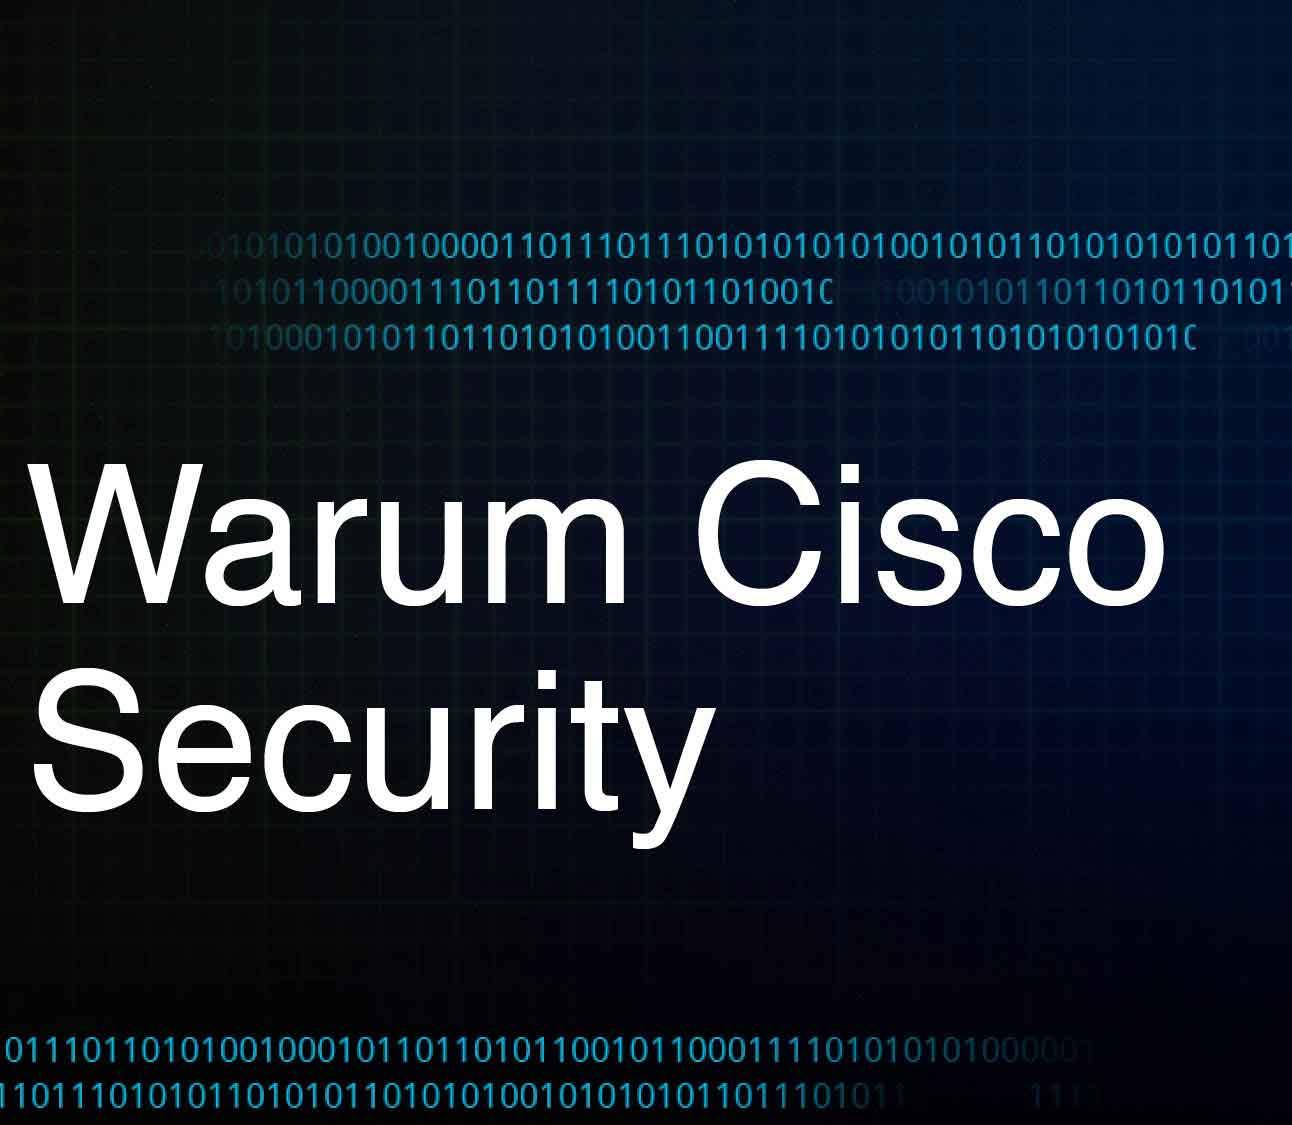 WARUM CISCO SECUITY Featured Image